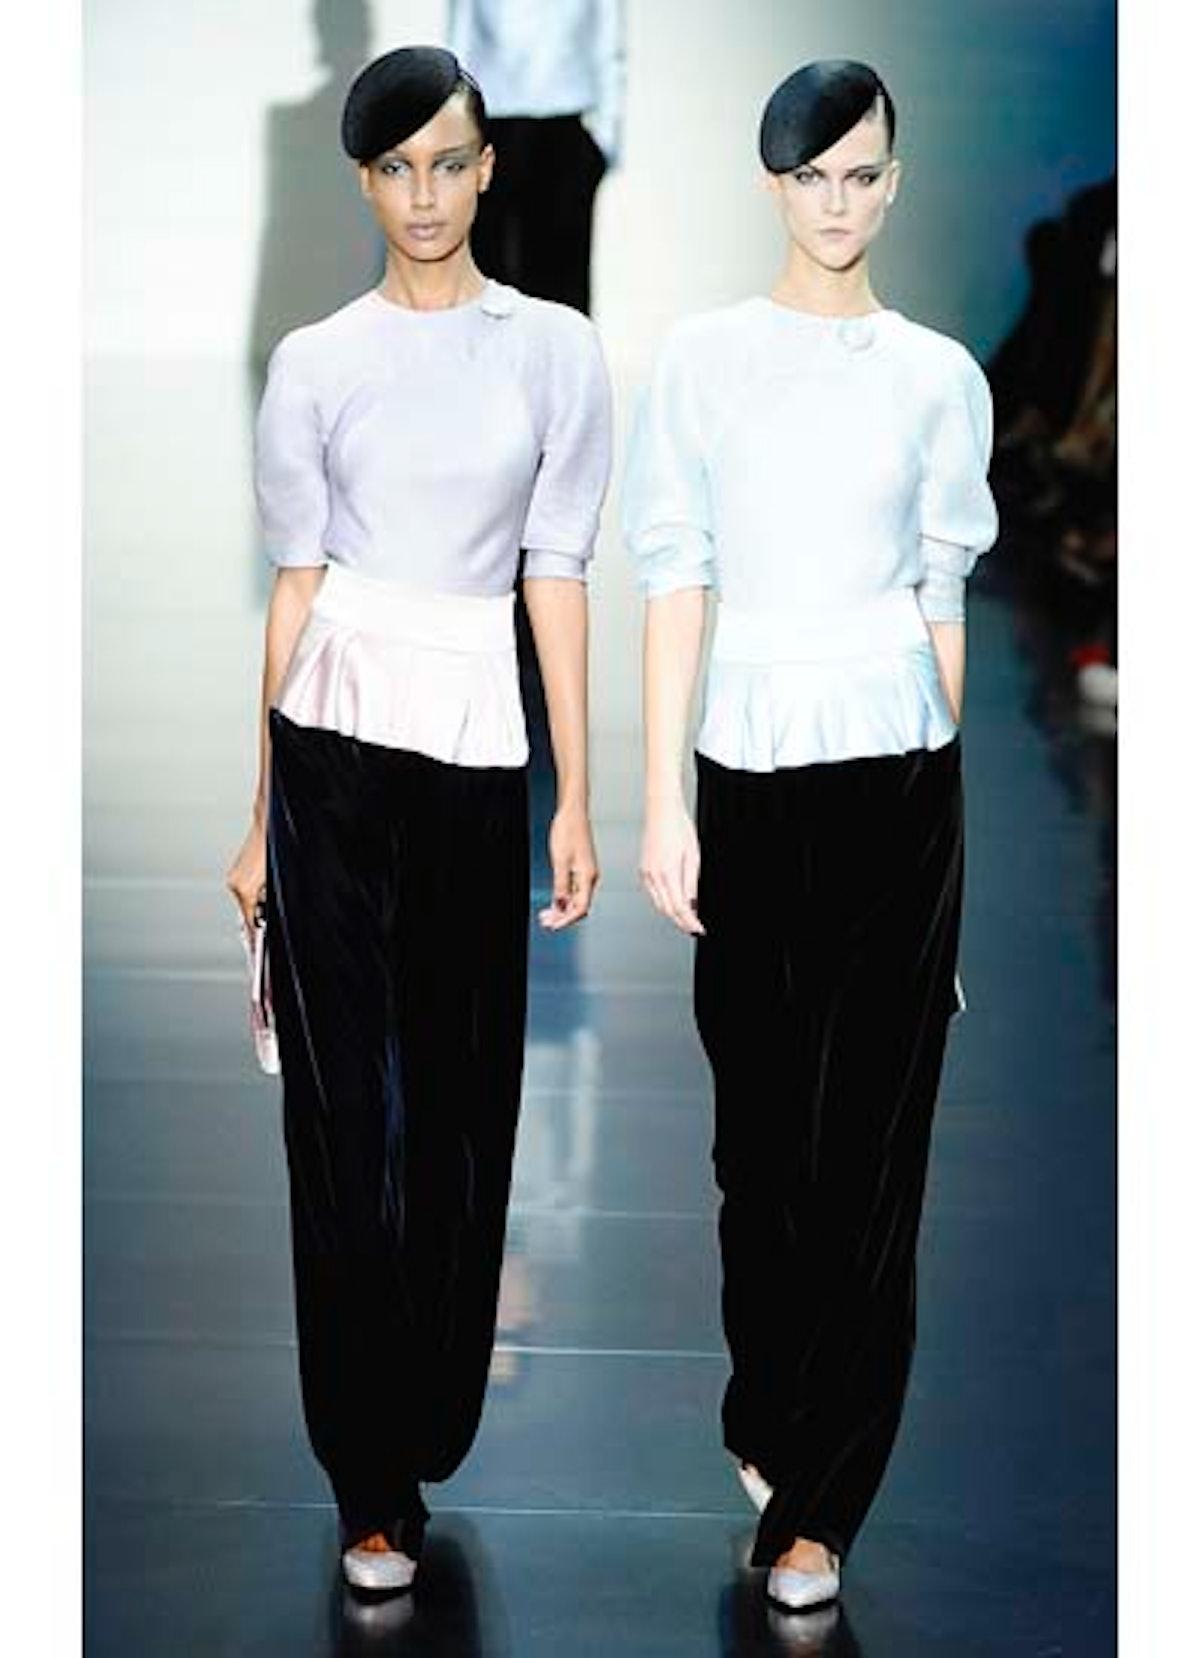 fass-giorgio-armani-couture-2012-runway-05-v.jpg